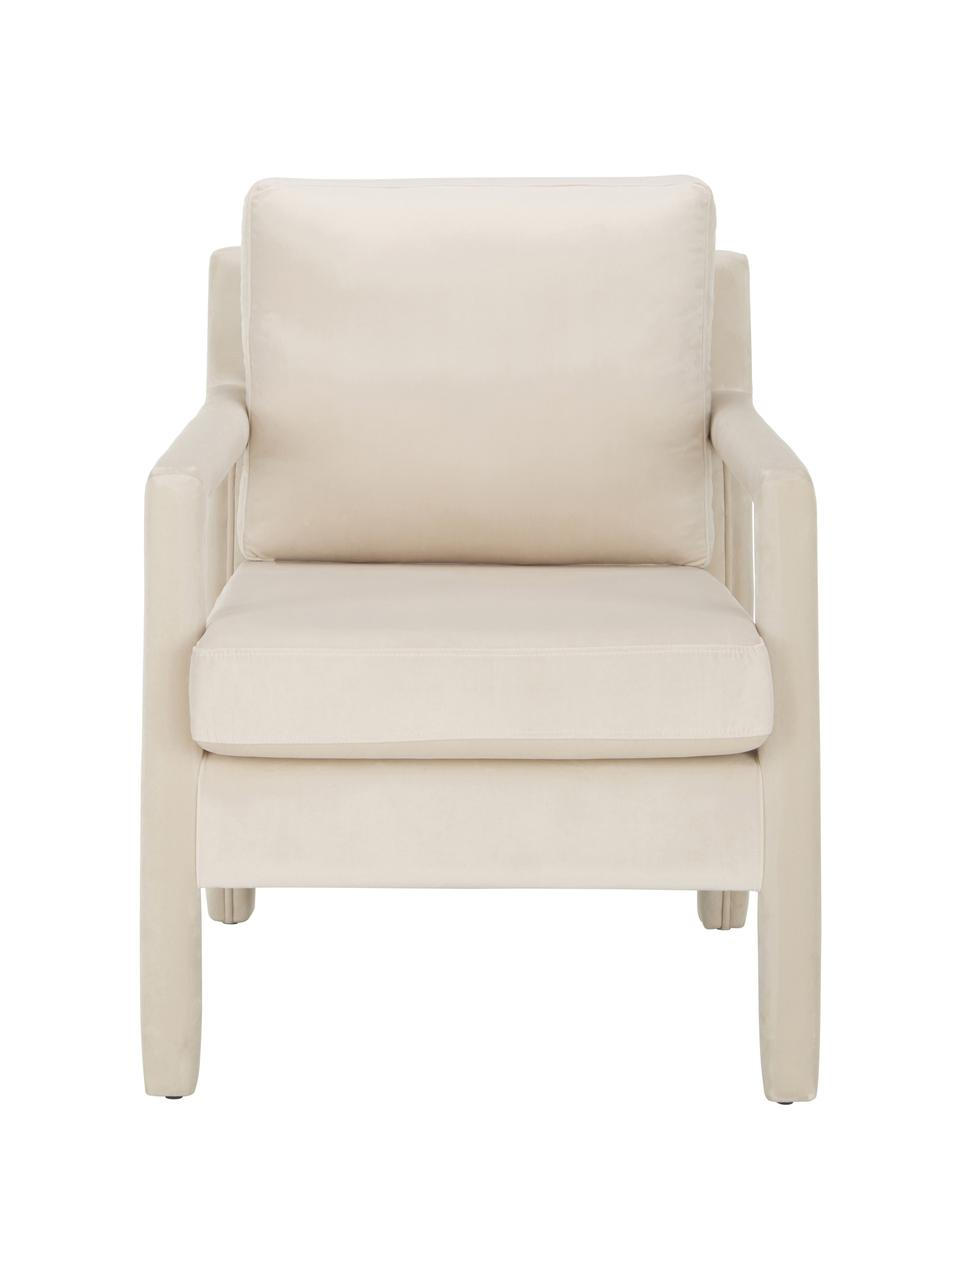 Samt-Sessel Claudette in Beige, Bezug: Samt (100% Polyester) Der, Gestell: Massives Kiefernholz, Spe, Beige, B 65 x T 75 cm